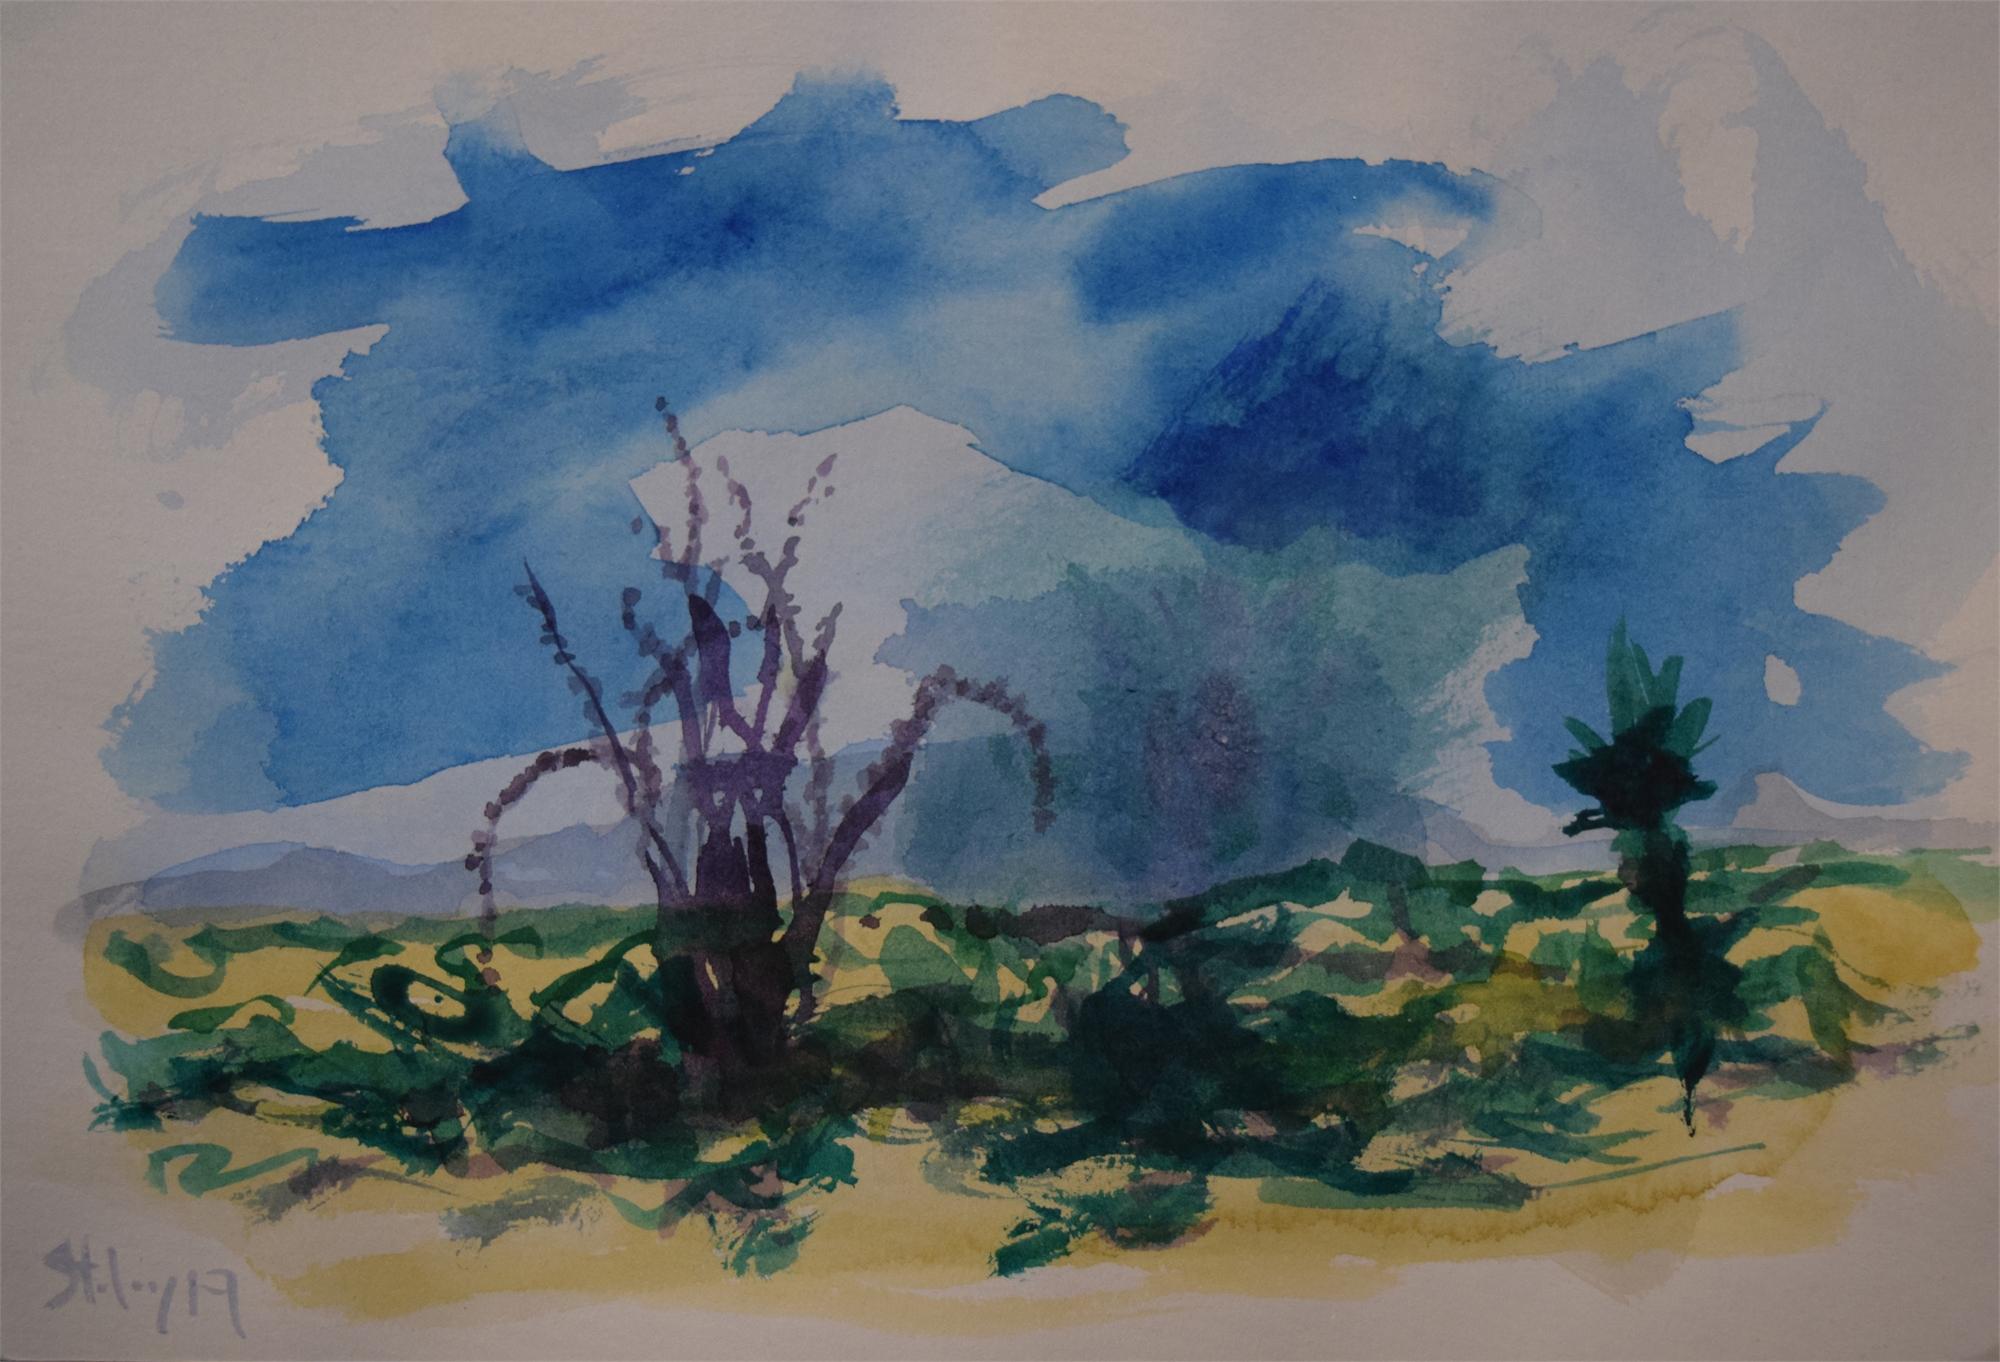 Big Bend 2 by Earl Staley